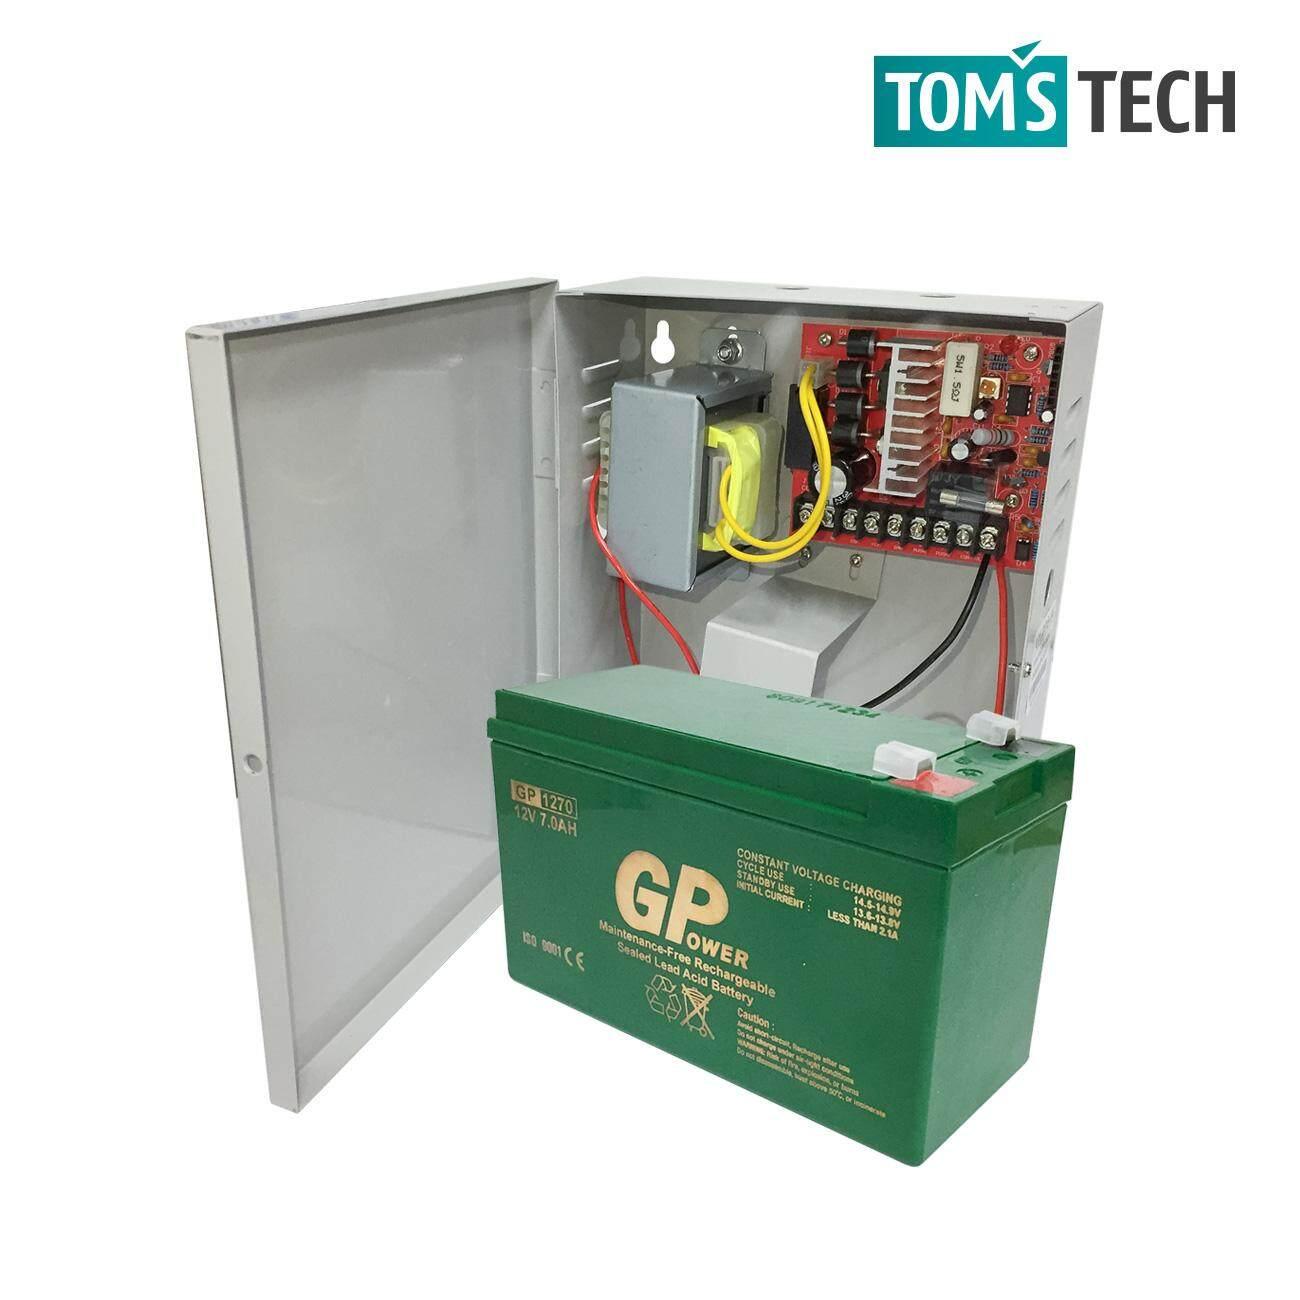 COMBO: U1205-A 12VDC UPS Power Supply + GPower 12V7AH Backup Battery for Door Access